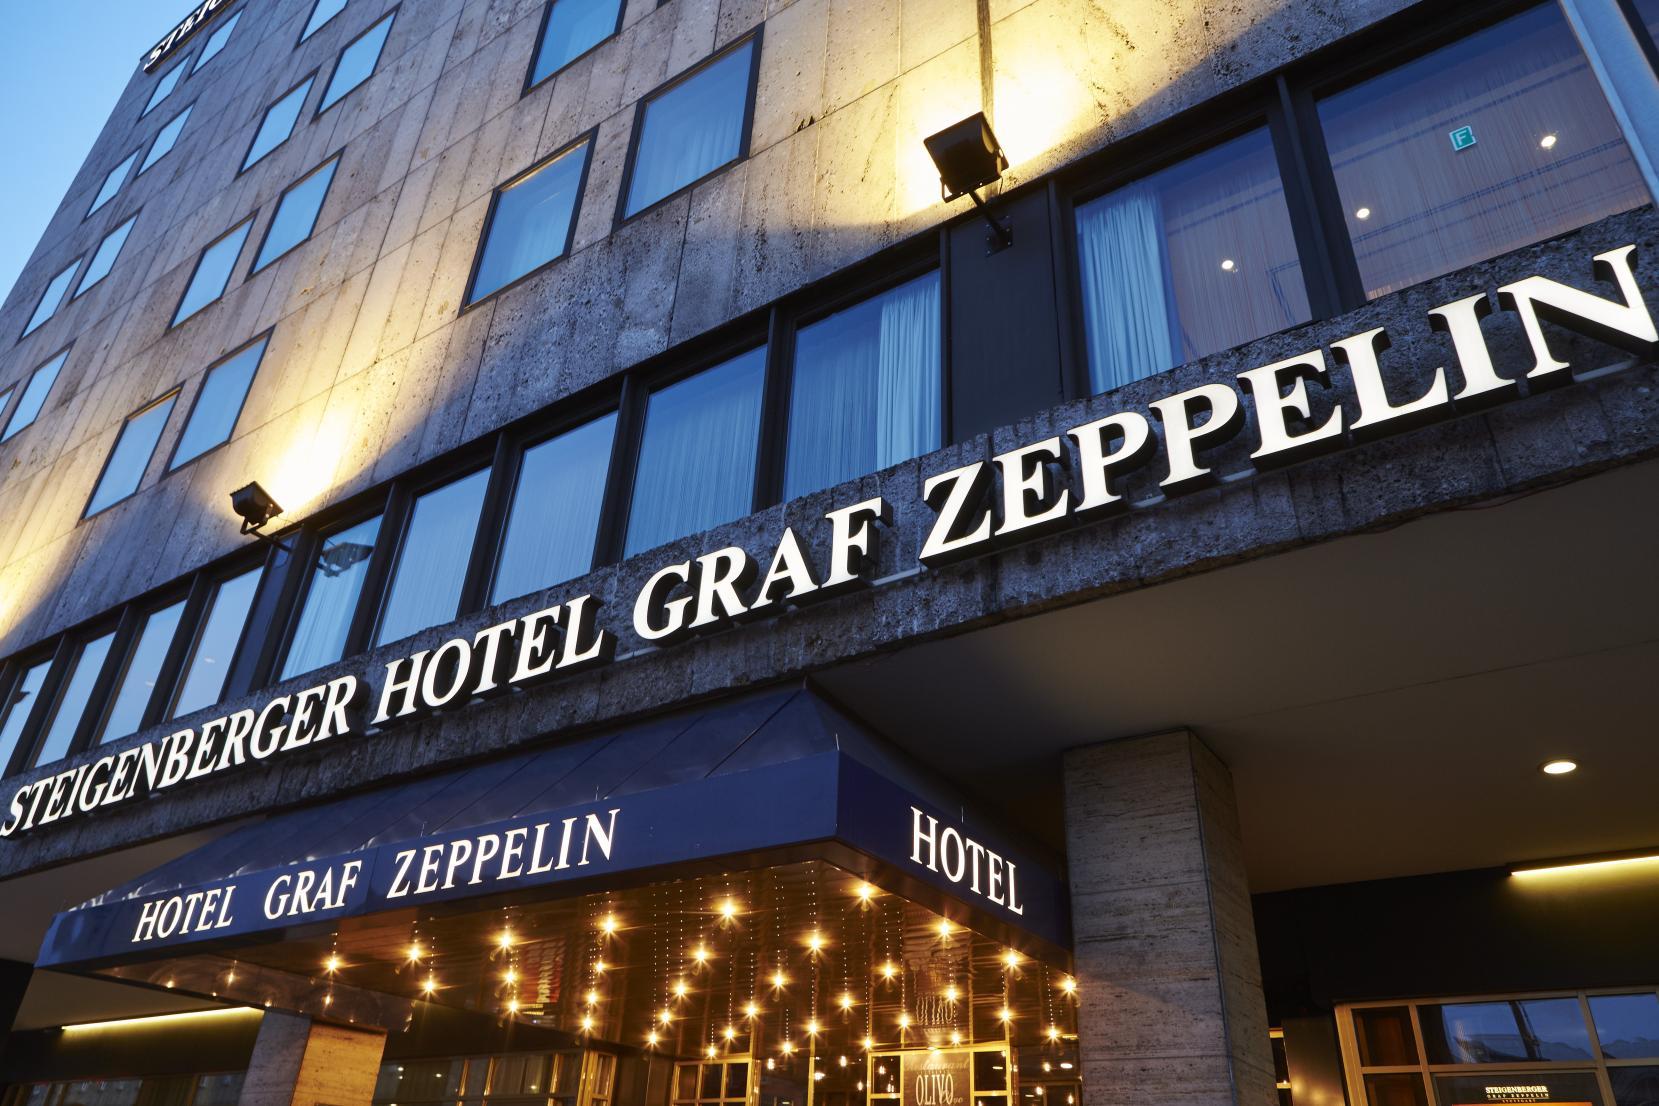 012_SHR_Stuttgart_Steigenberger Graf Zeppelin_Hotel_Au+ãÆenansicht_Eingang_CBP-01